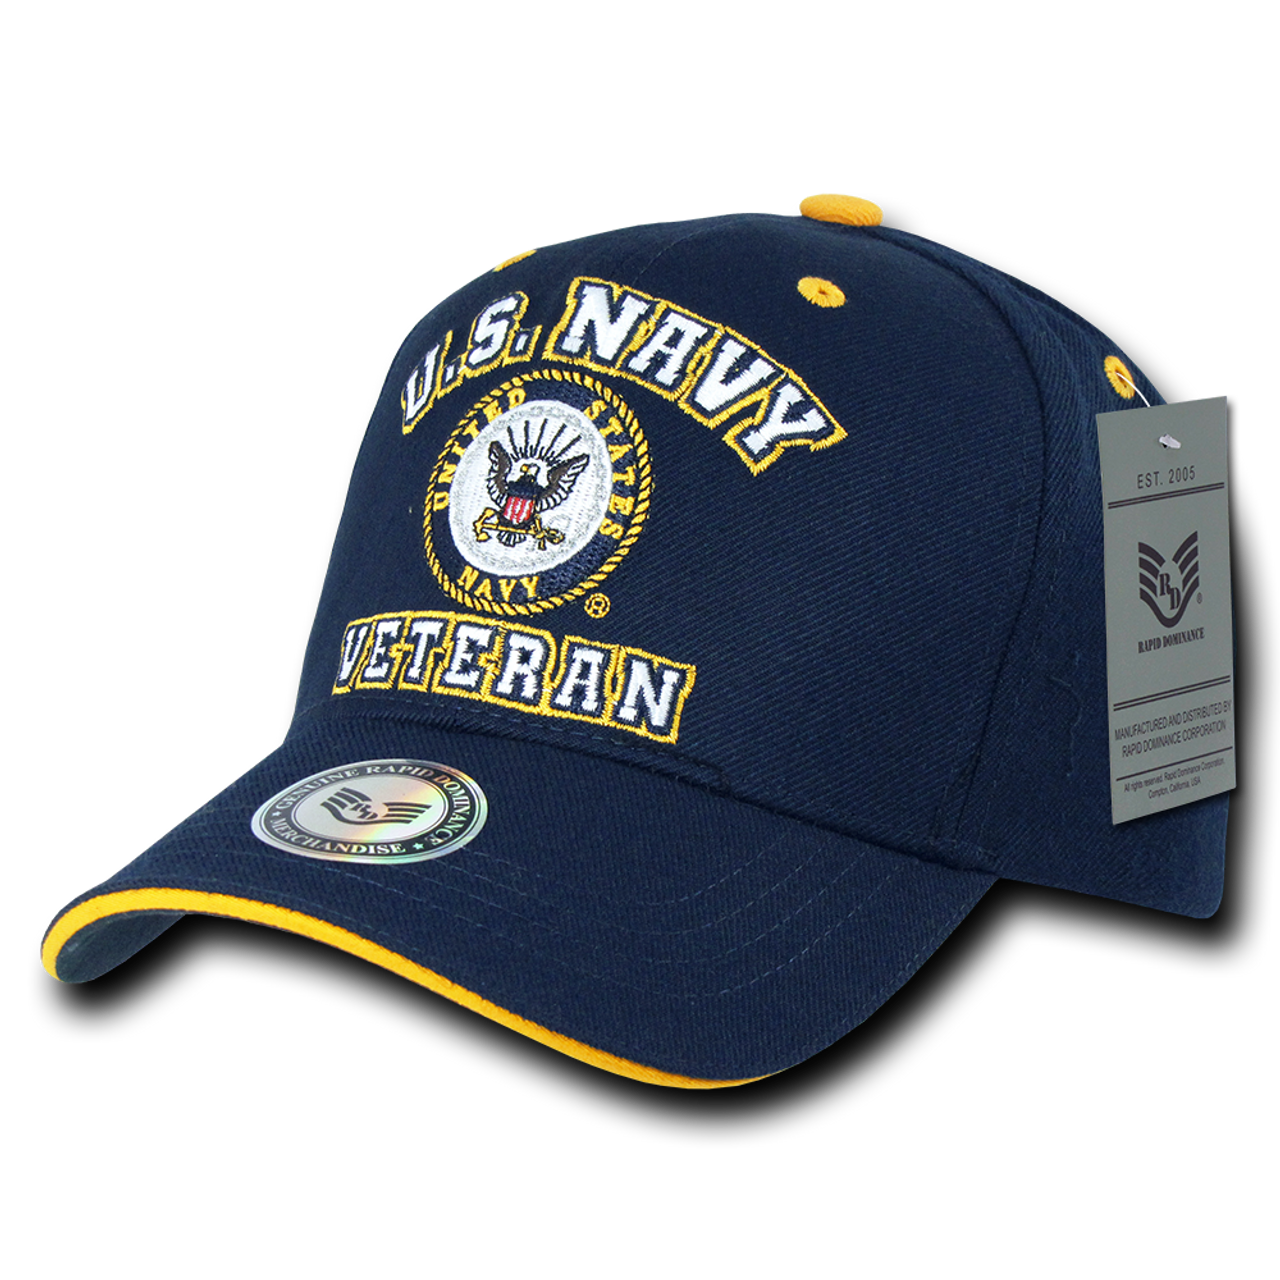 Vet Veteran Cap Us Navy Navy Us Military Hats - Us-military-vet